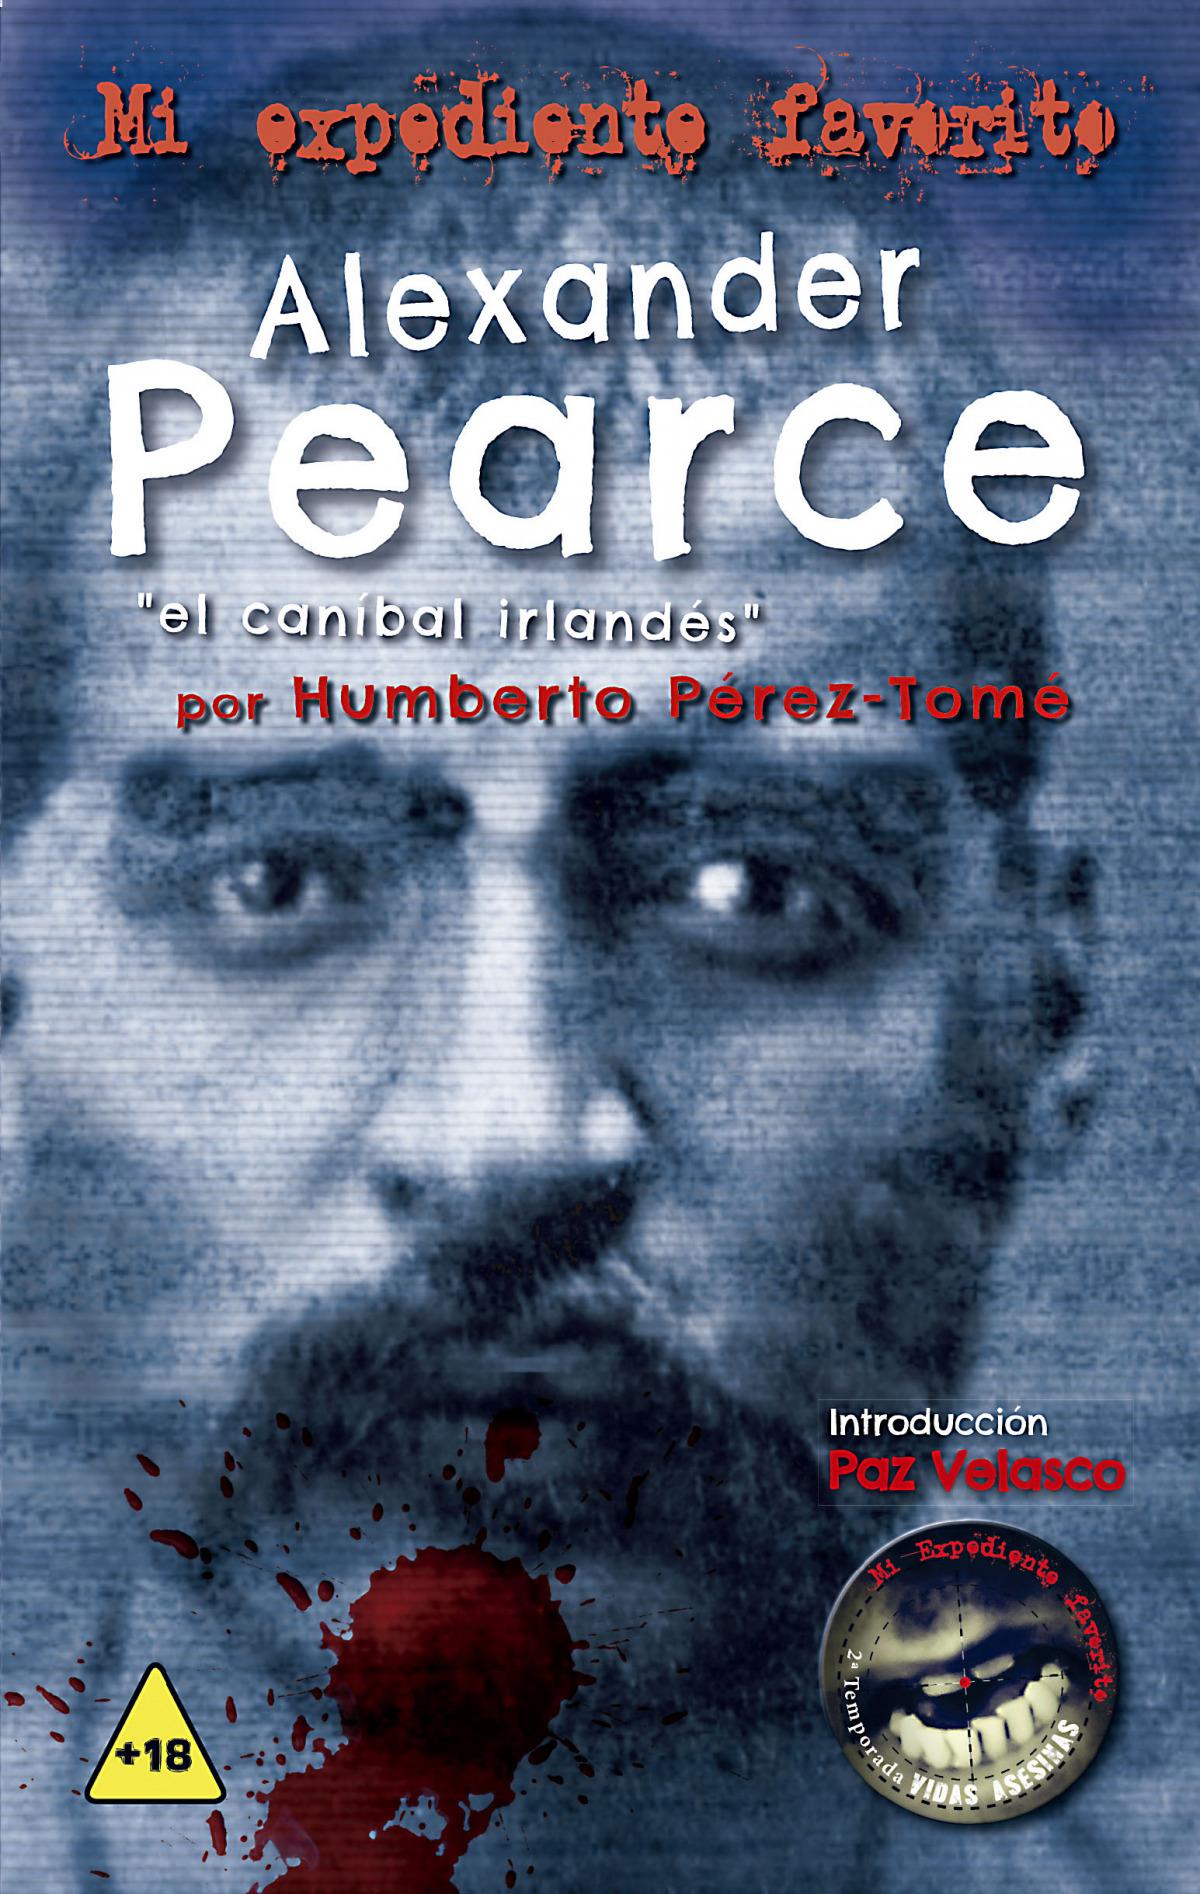 Alexander Pearce, el caníbal irlandés